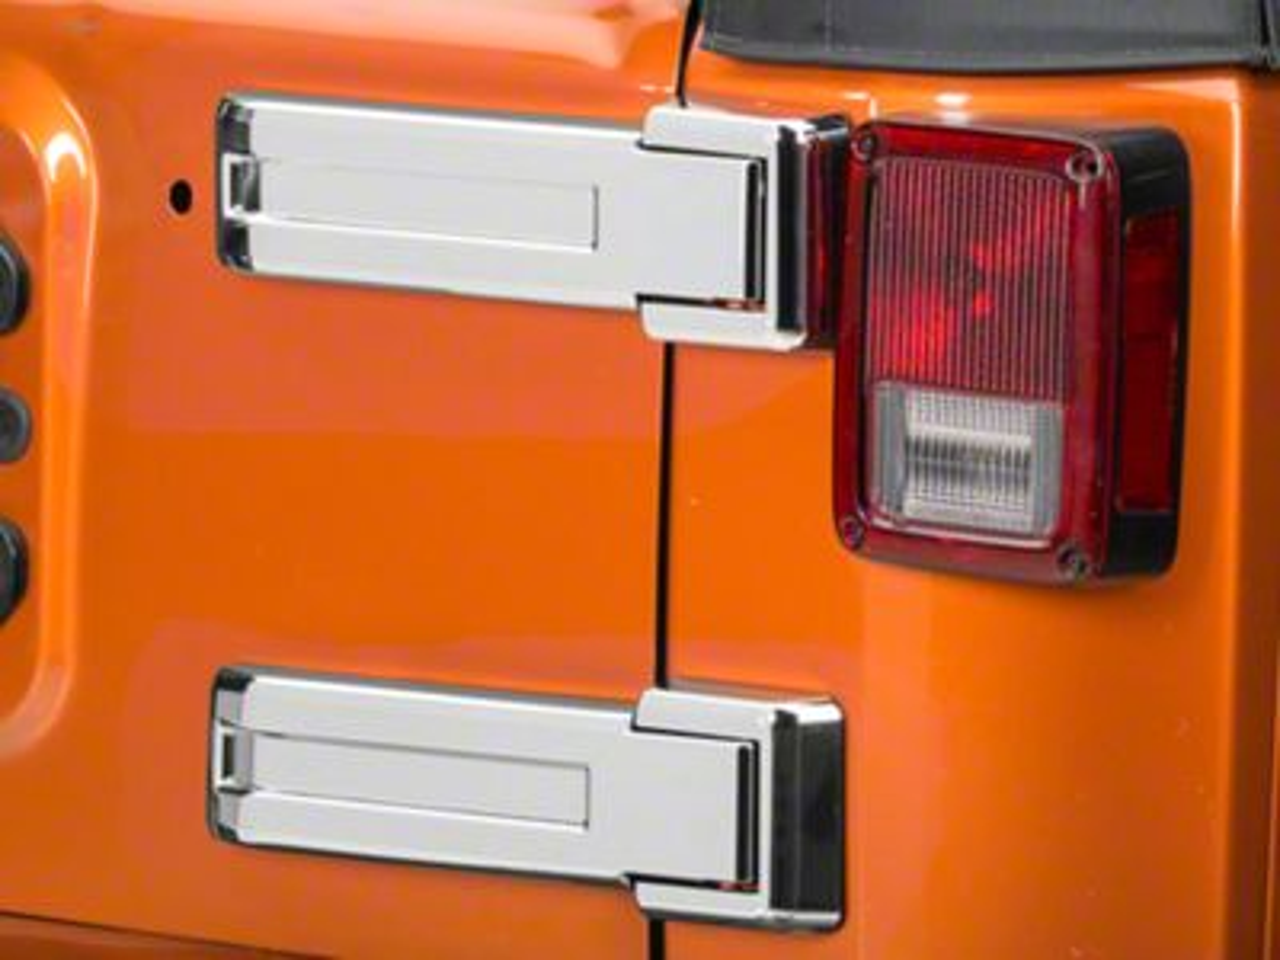 Putco ABS Rear Hinge Cover - Chrome (08-18 Jeep Wrangler JK)